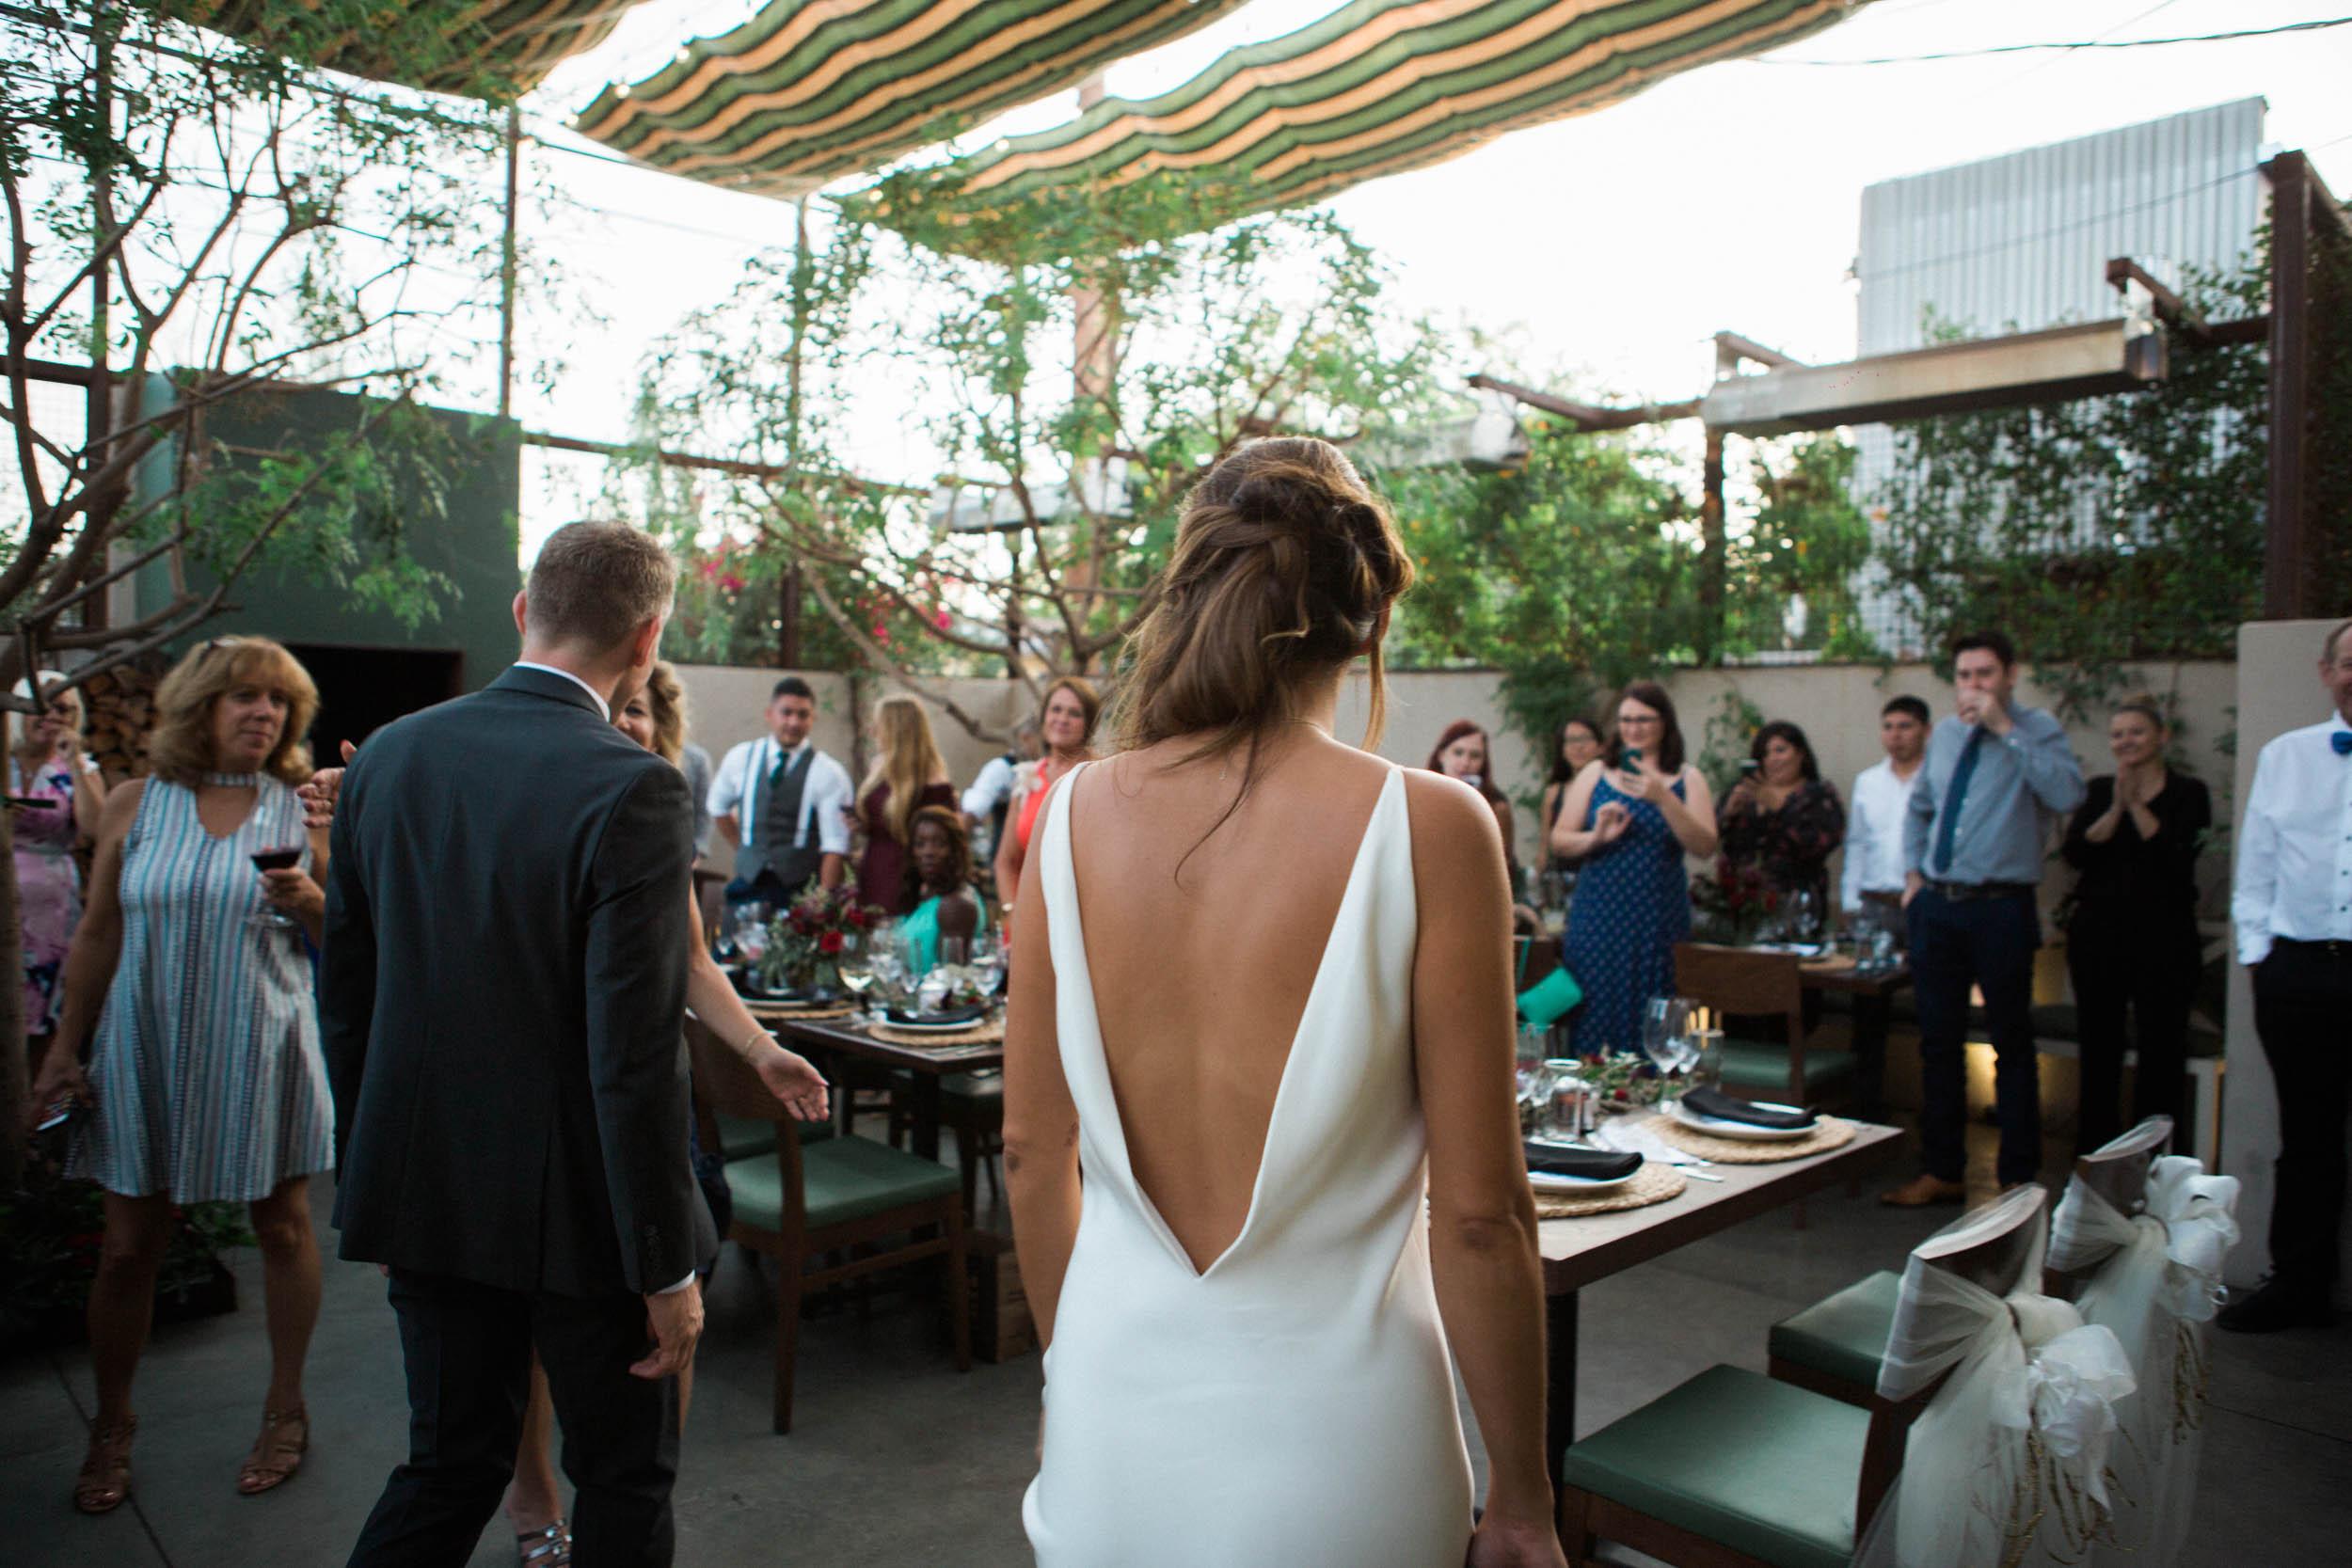 BKM-Photography-Highland-Park-Los-Angeles-Backyard-Wedding-0053.jpg